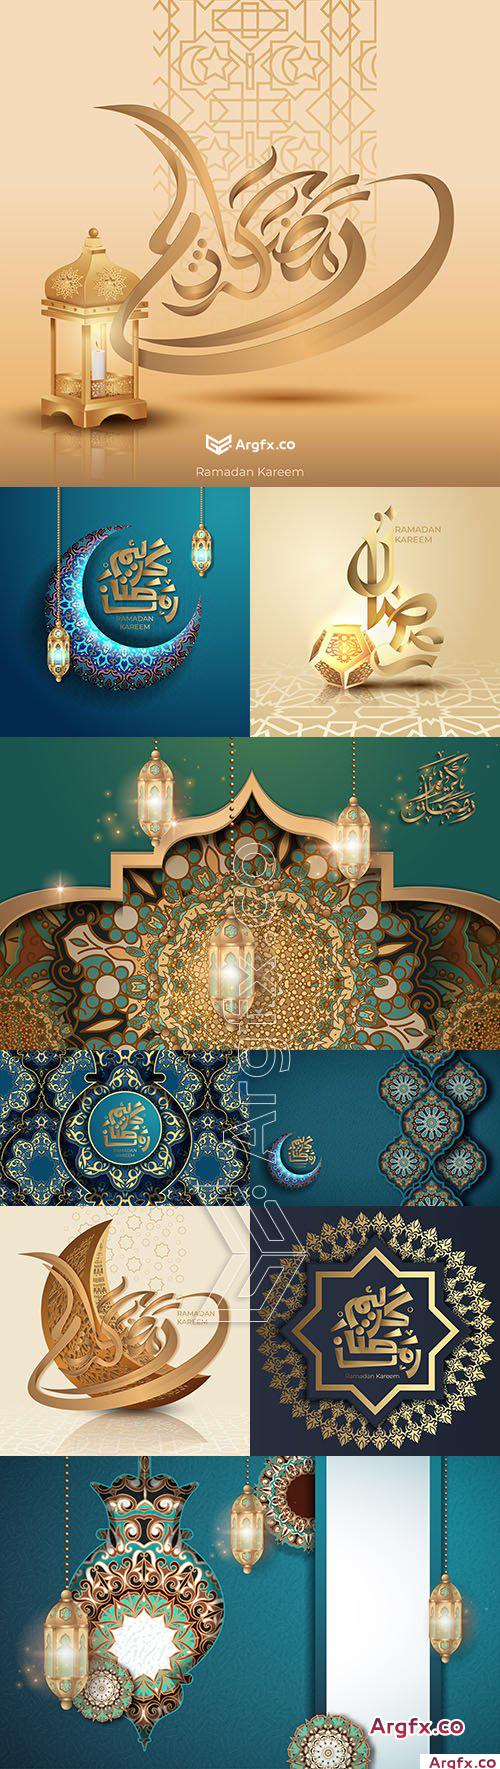 Ramadan Karrem design calligraphy greeting card